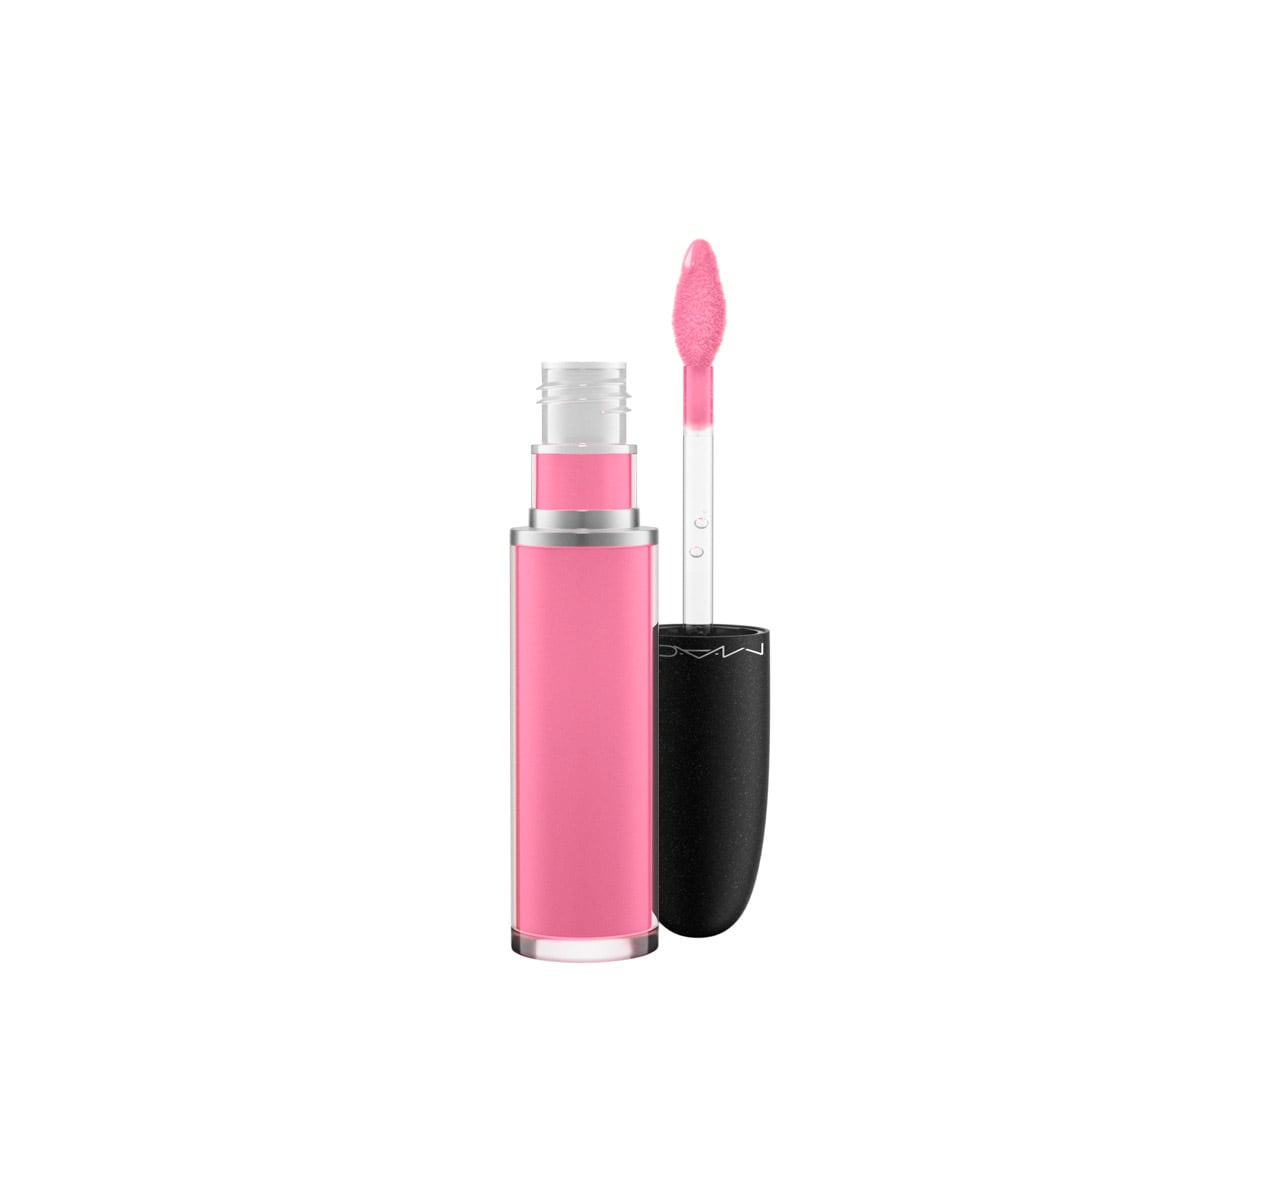 Lauder Fresh Makeup Air Estee